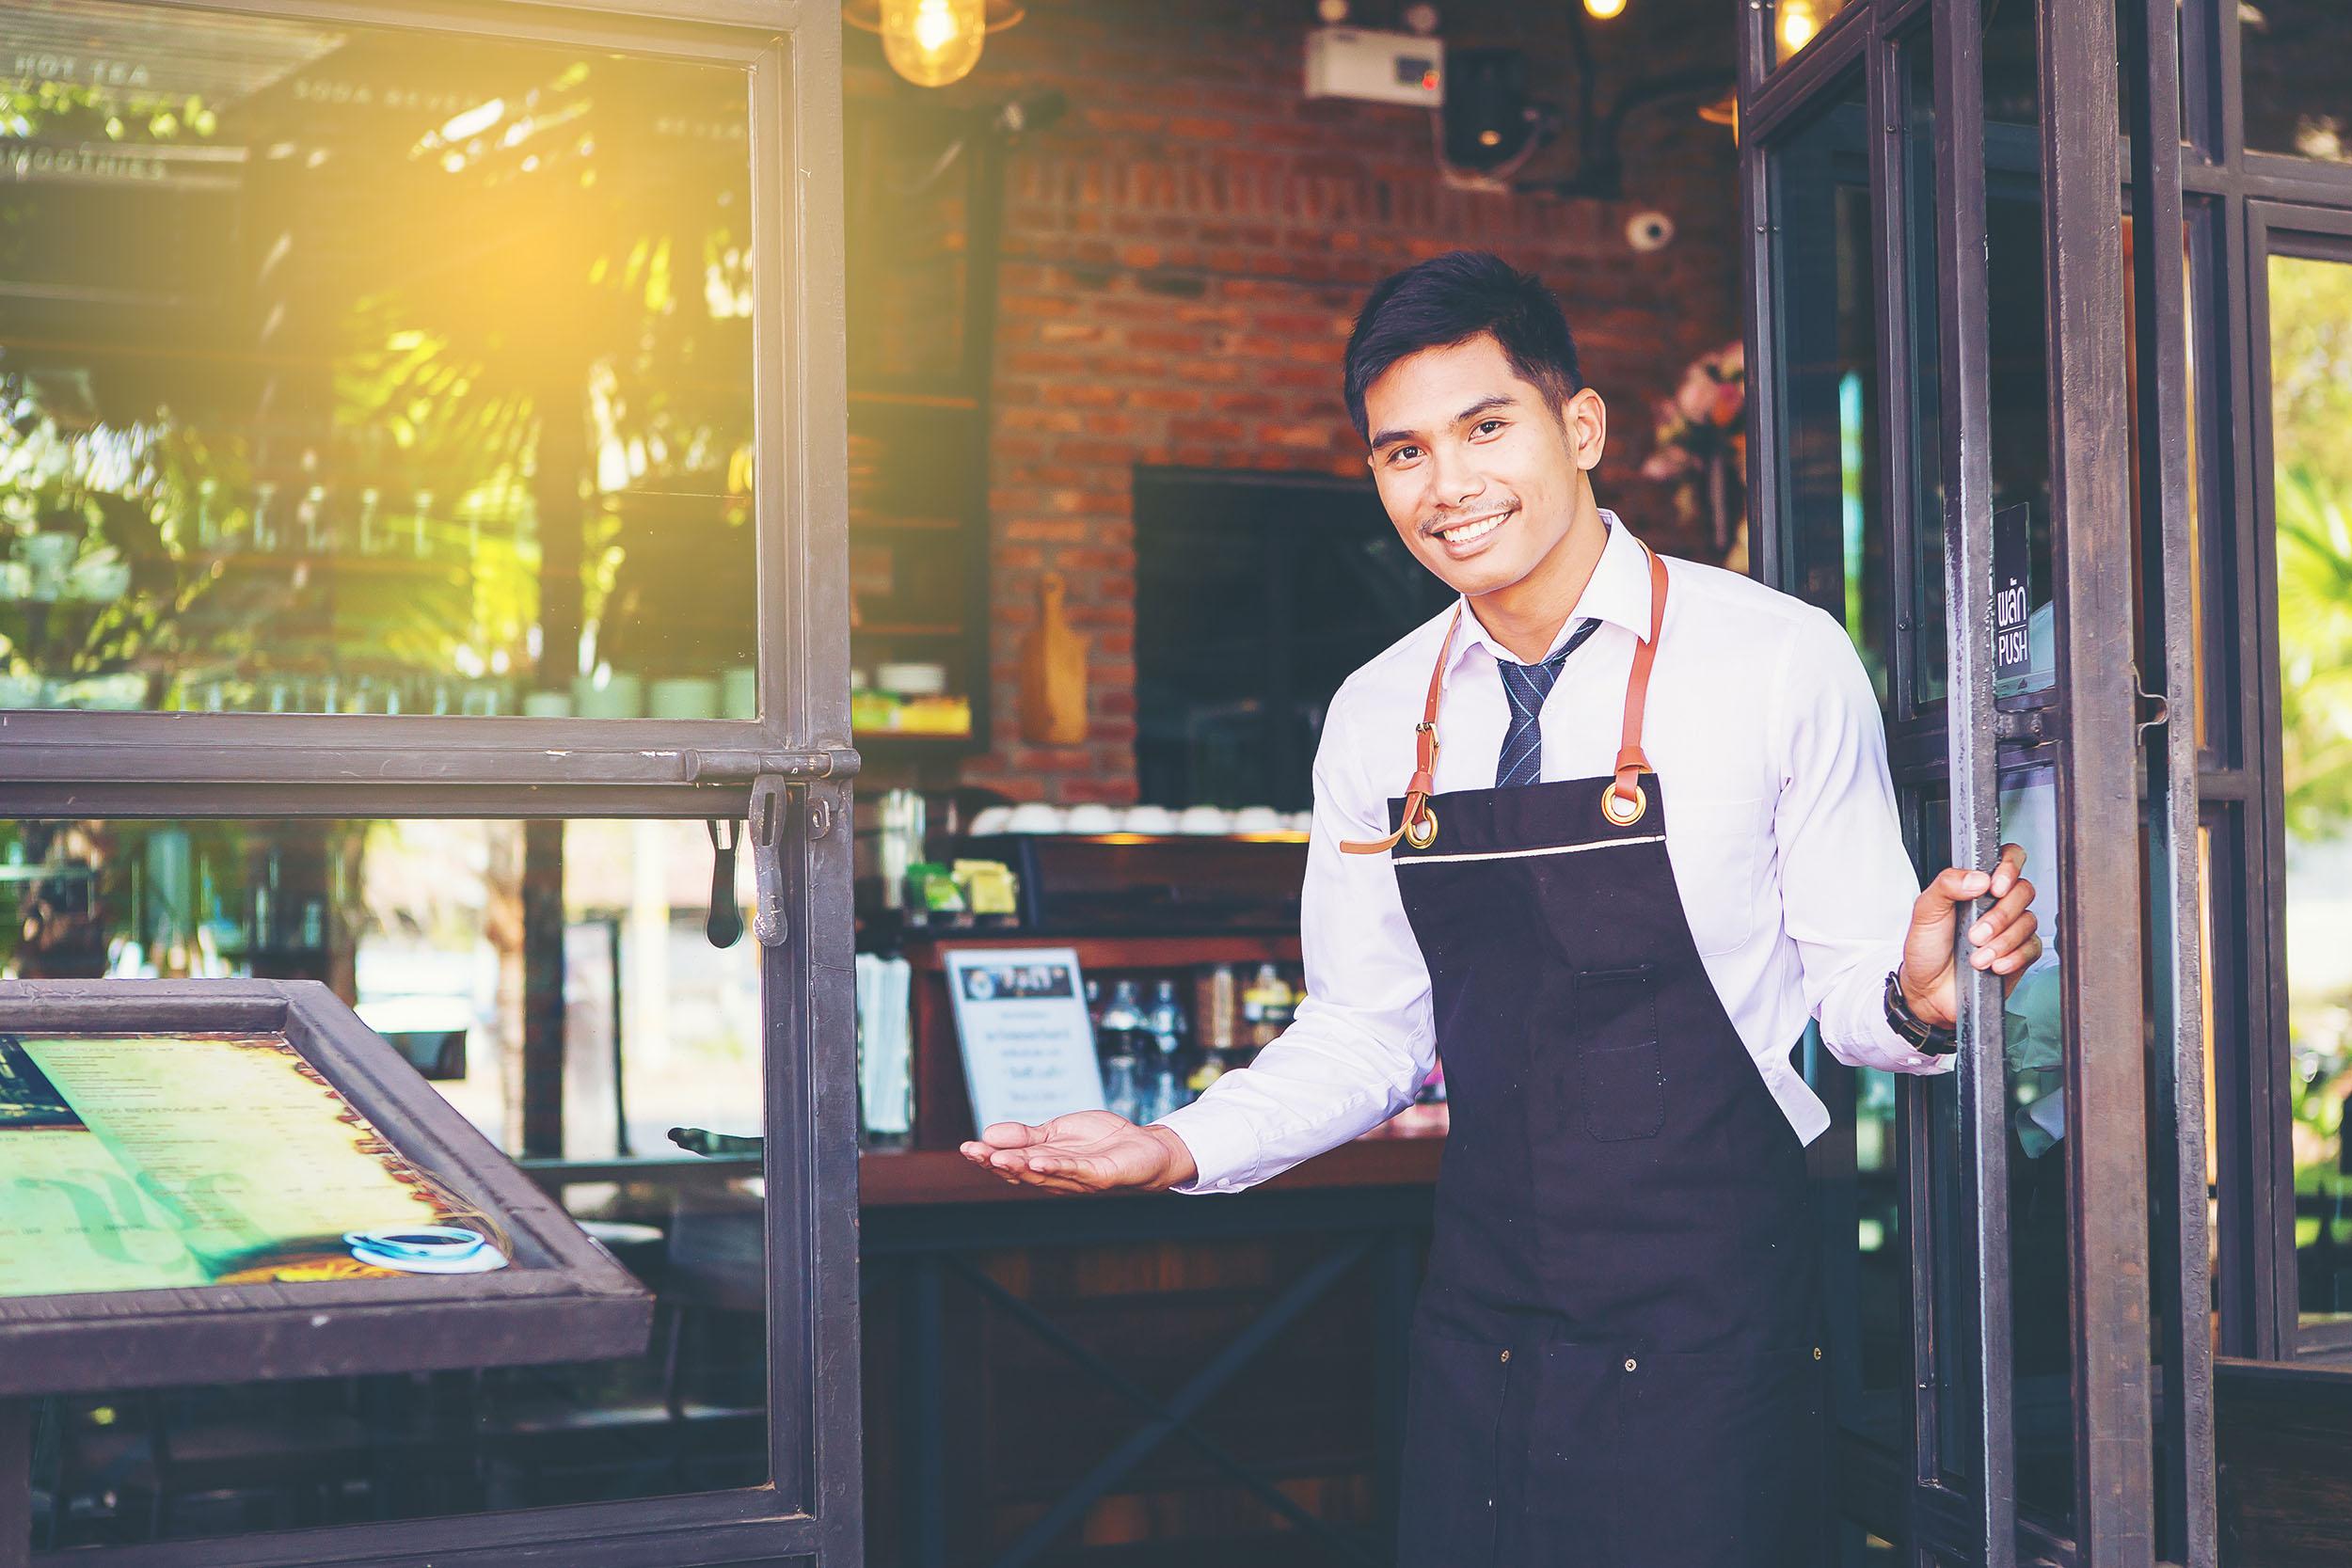 improve restaurant experience